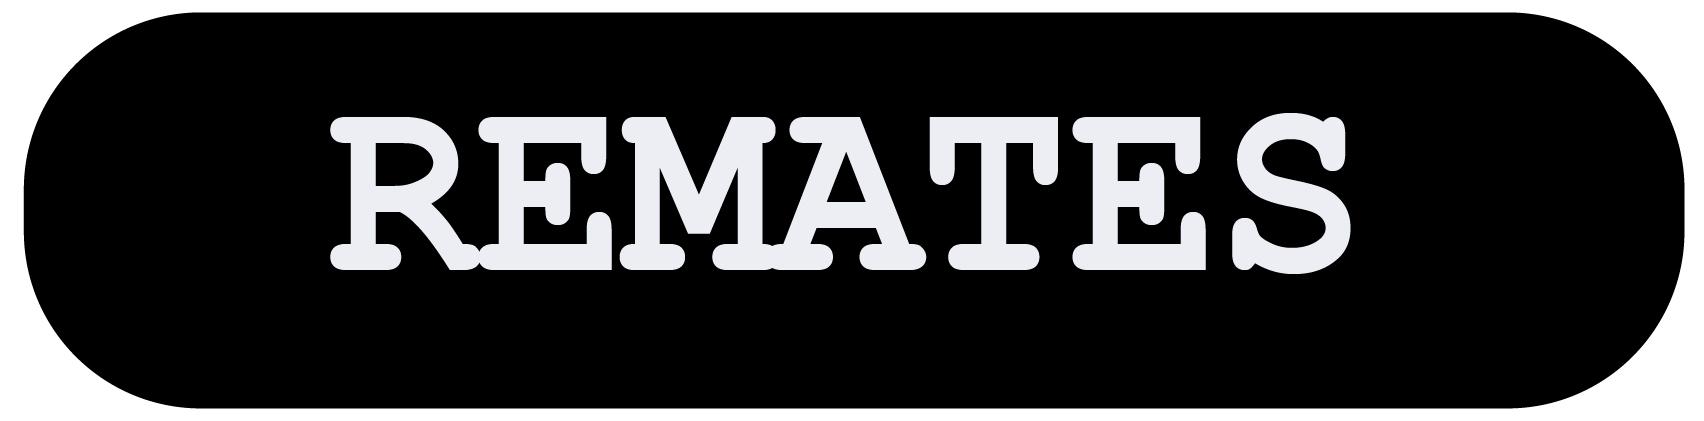 BTN_REMATE-01-01